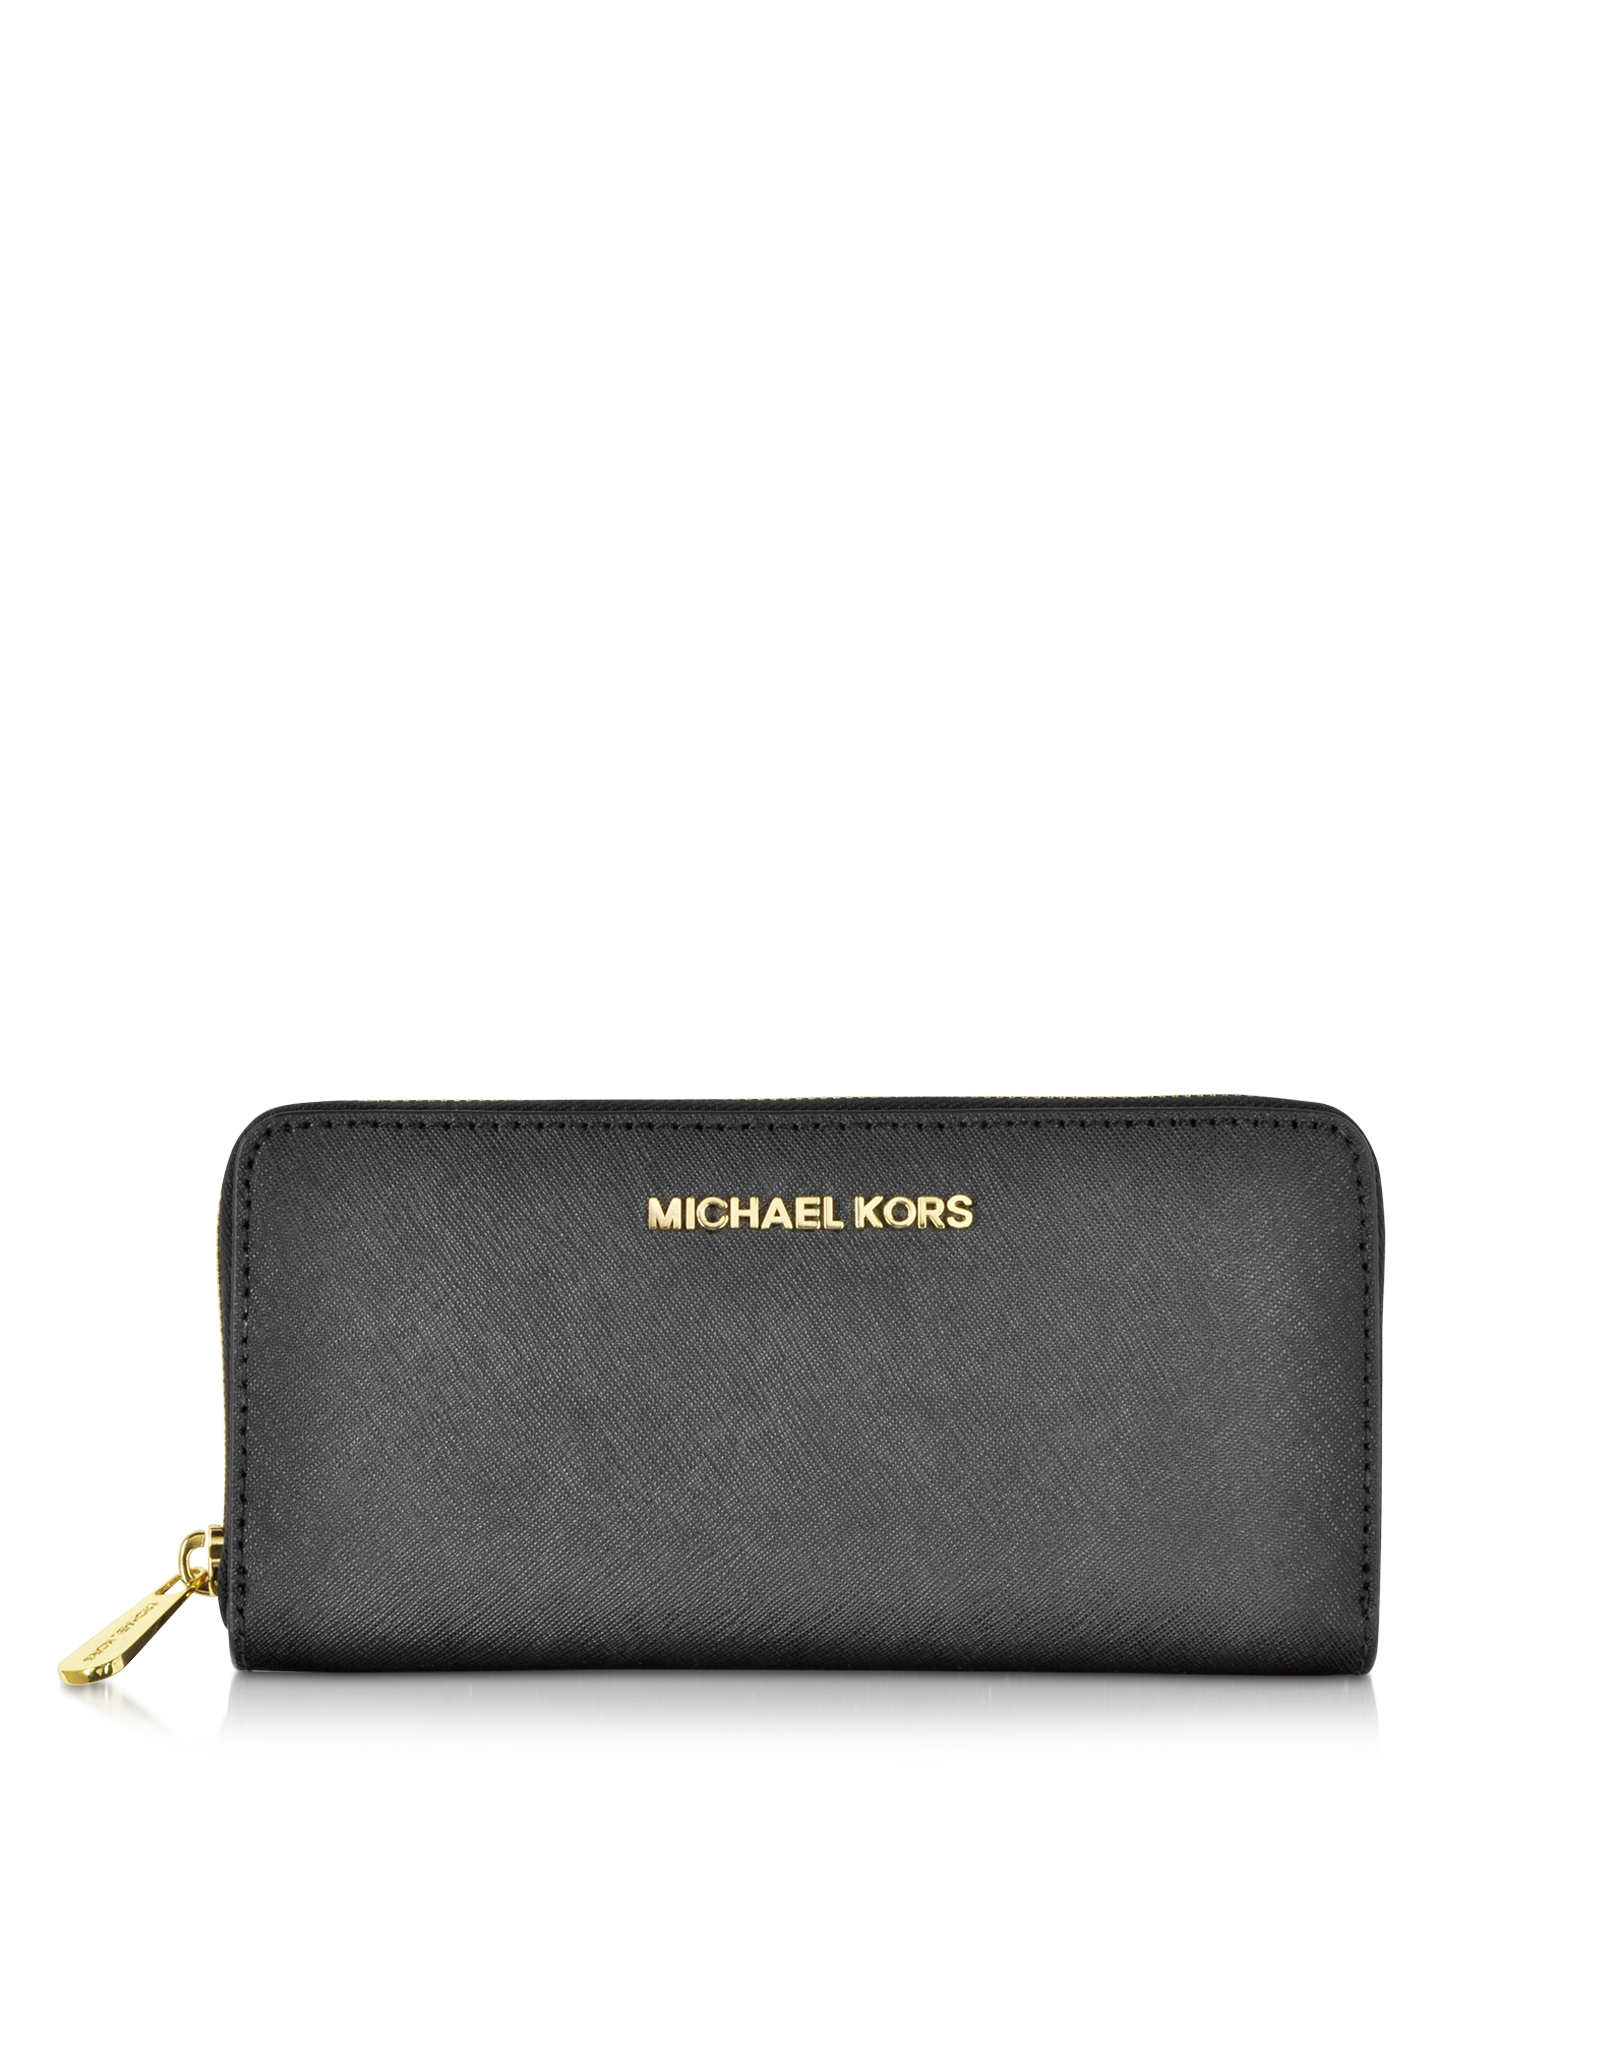 dbce96360cedca Michael kors jet set travel saffiano leather wallet - Singapore ...